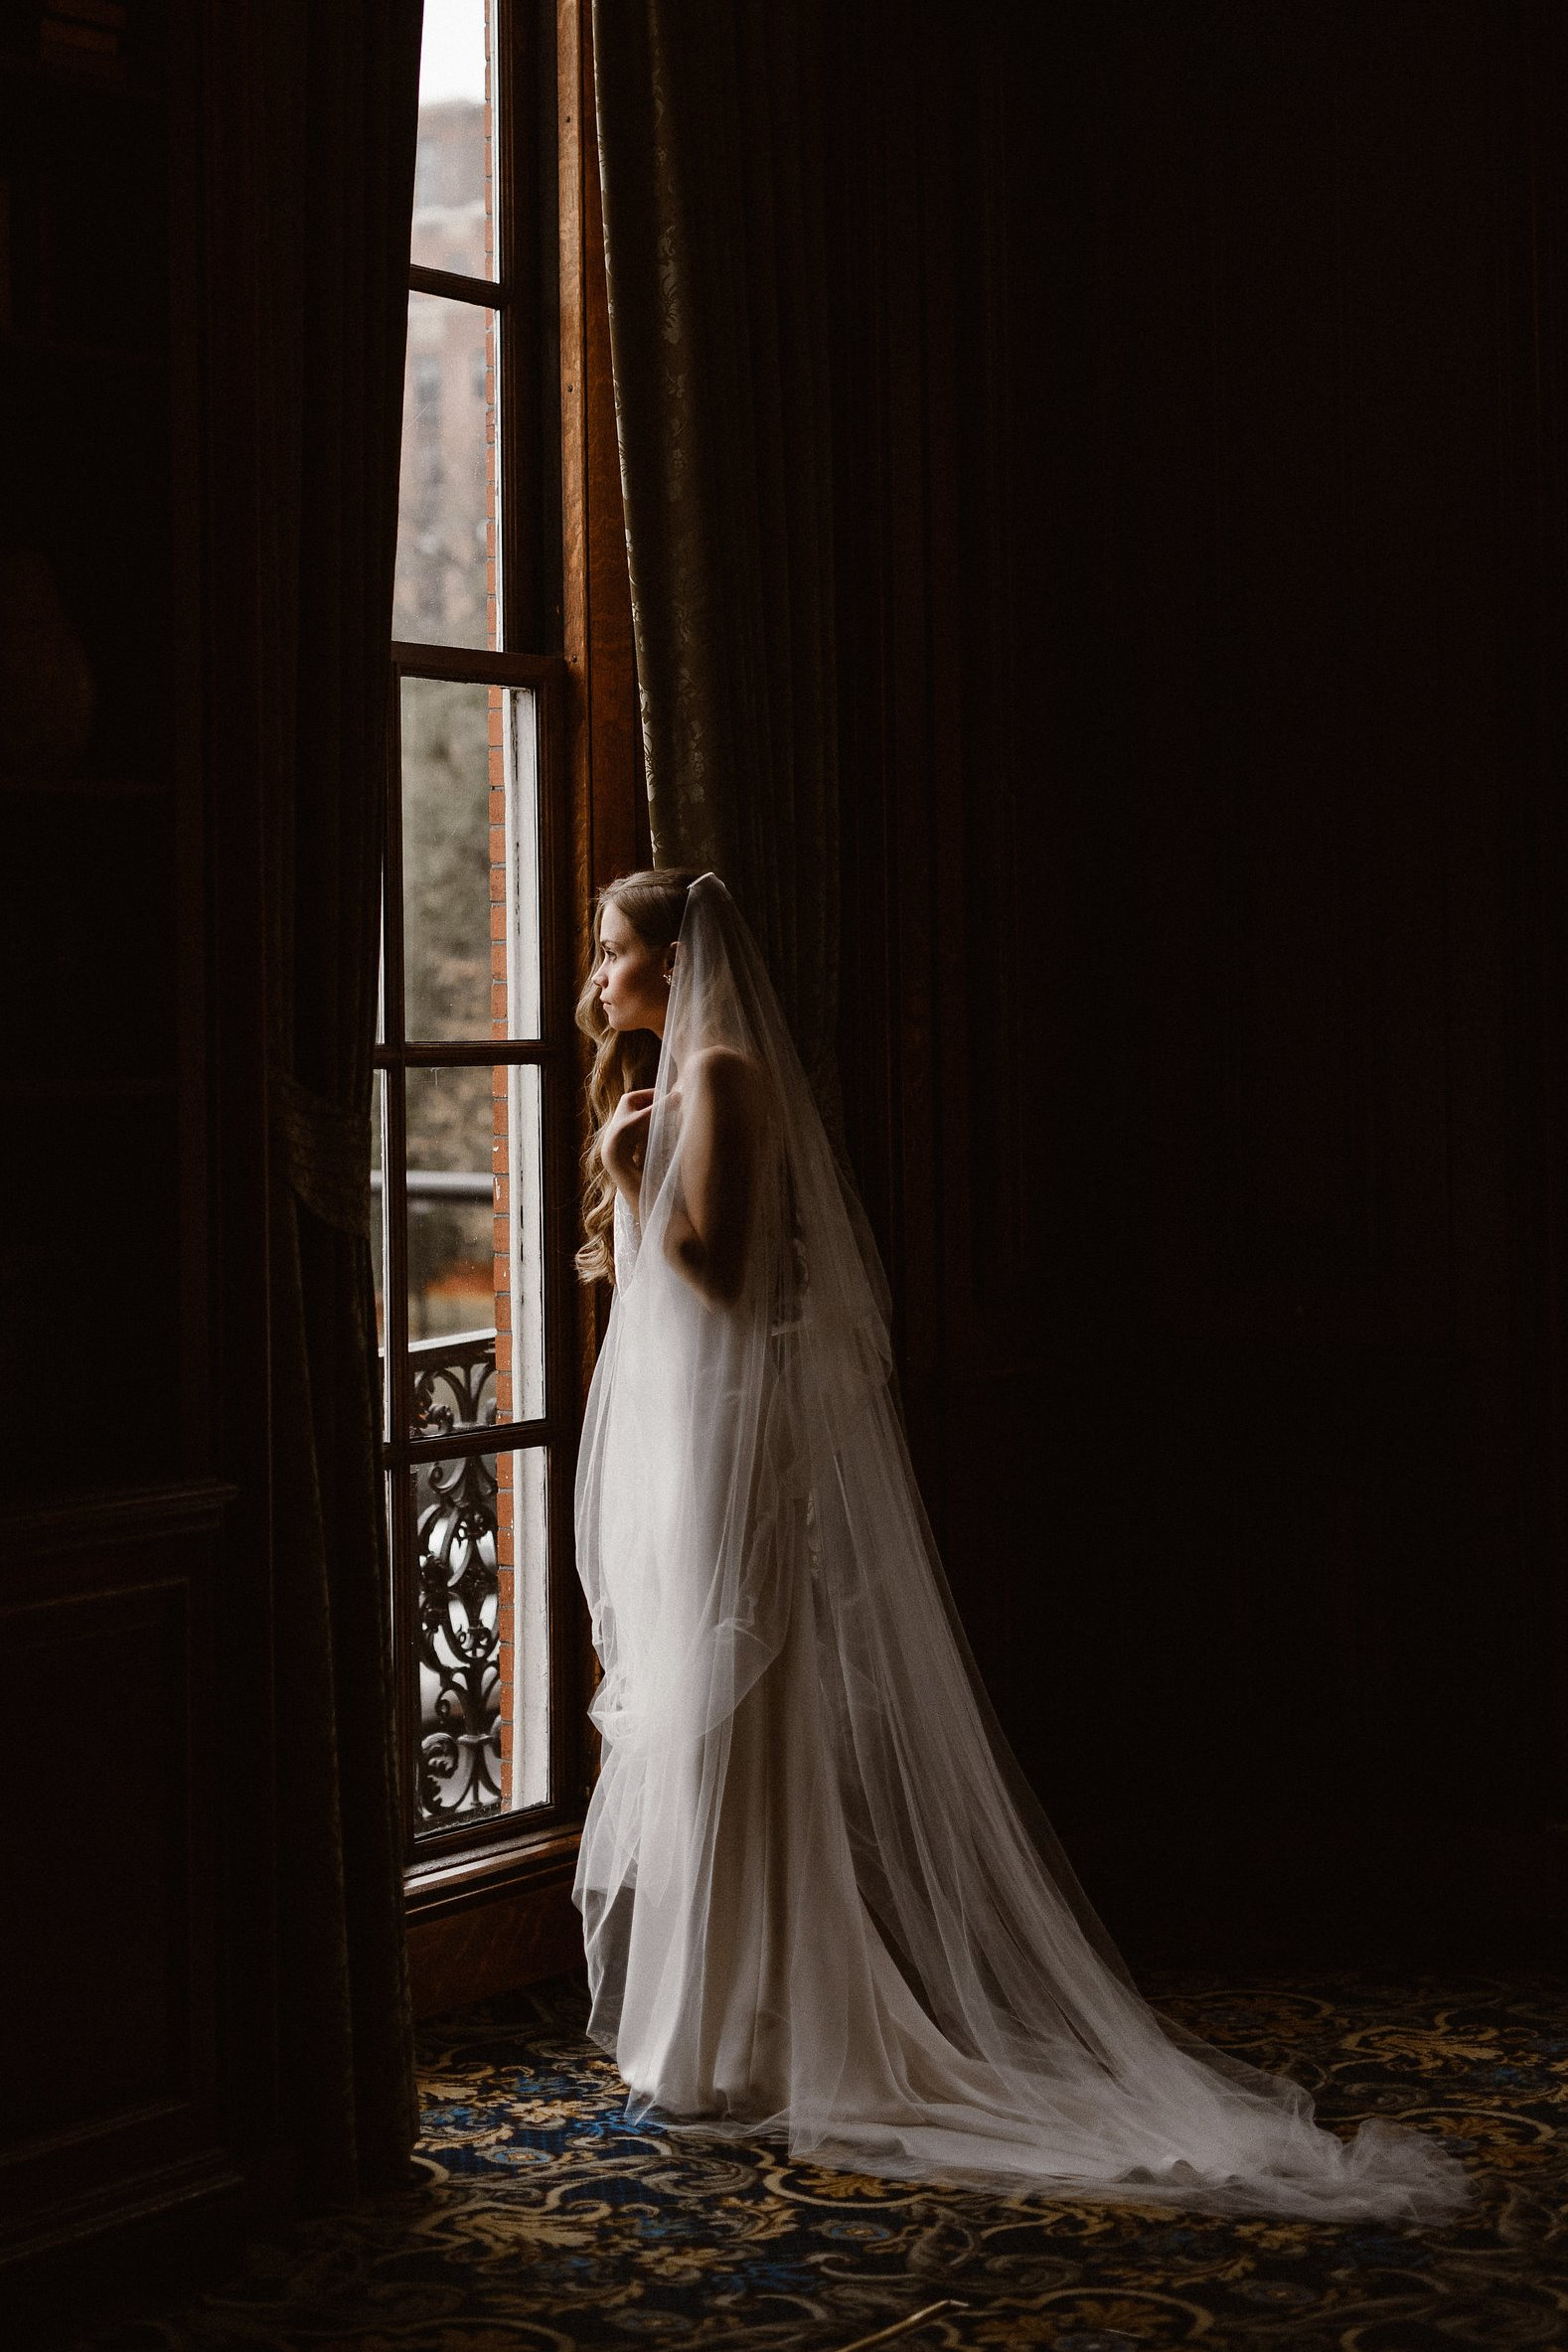 Elegant Modern Vintage Bride Getting Ready